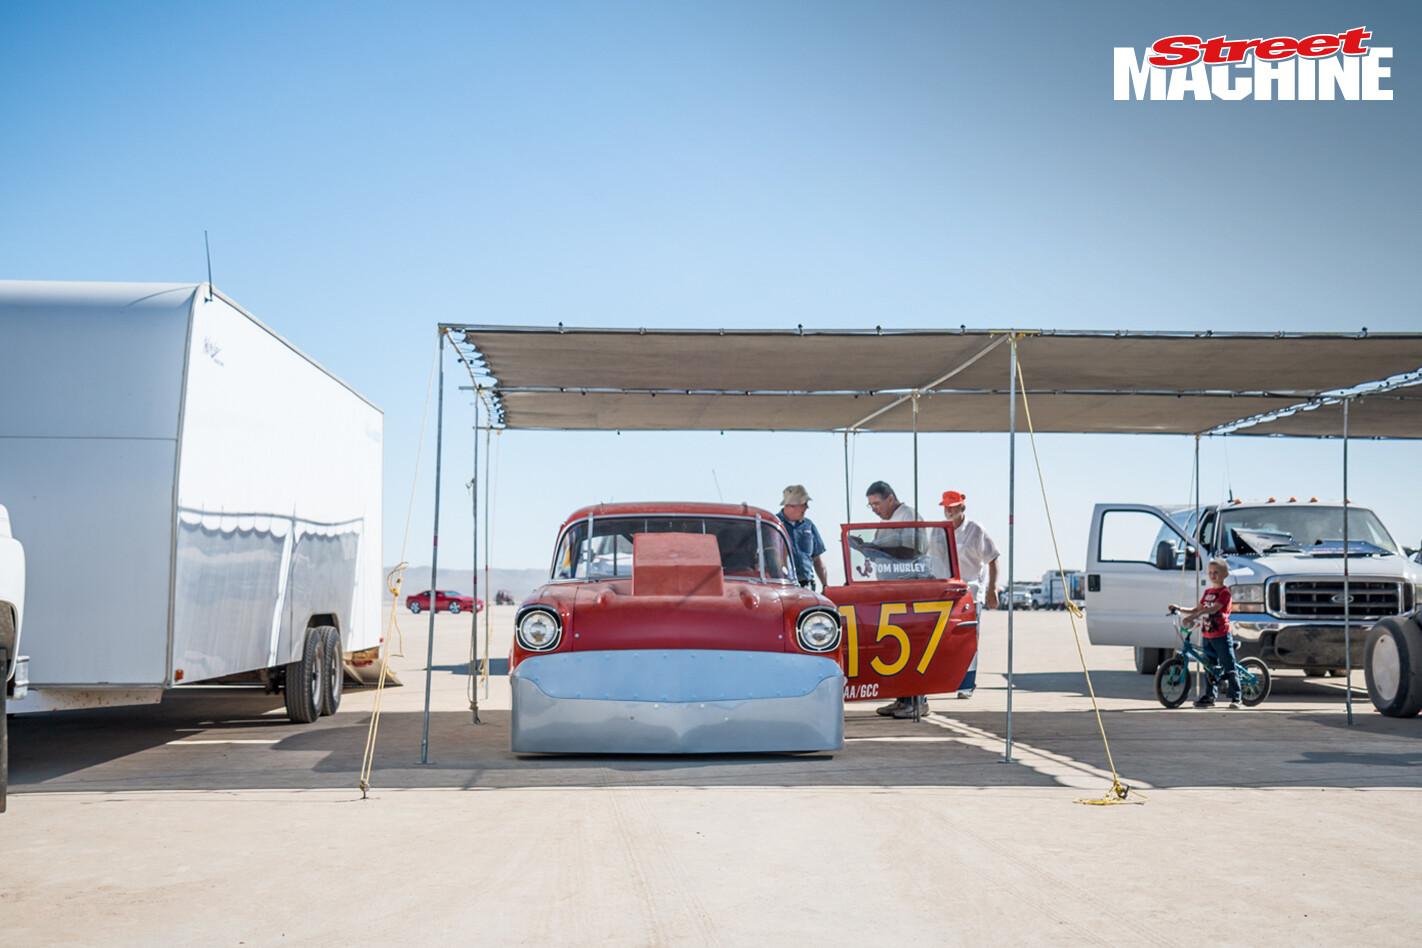 El Mirage Land Speed Racing 3800